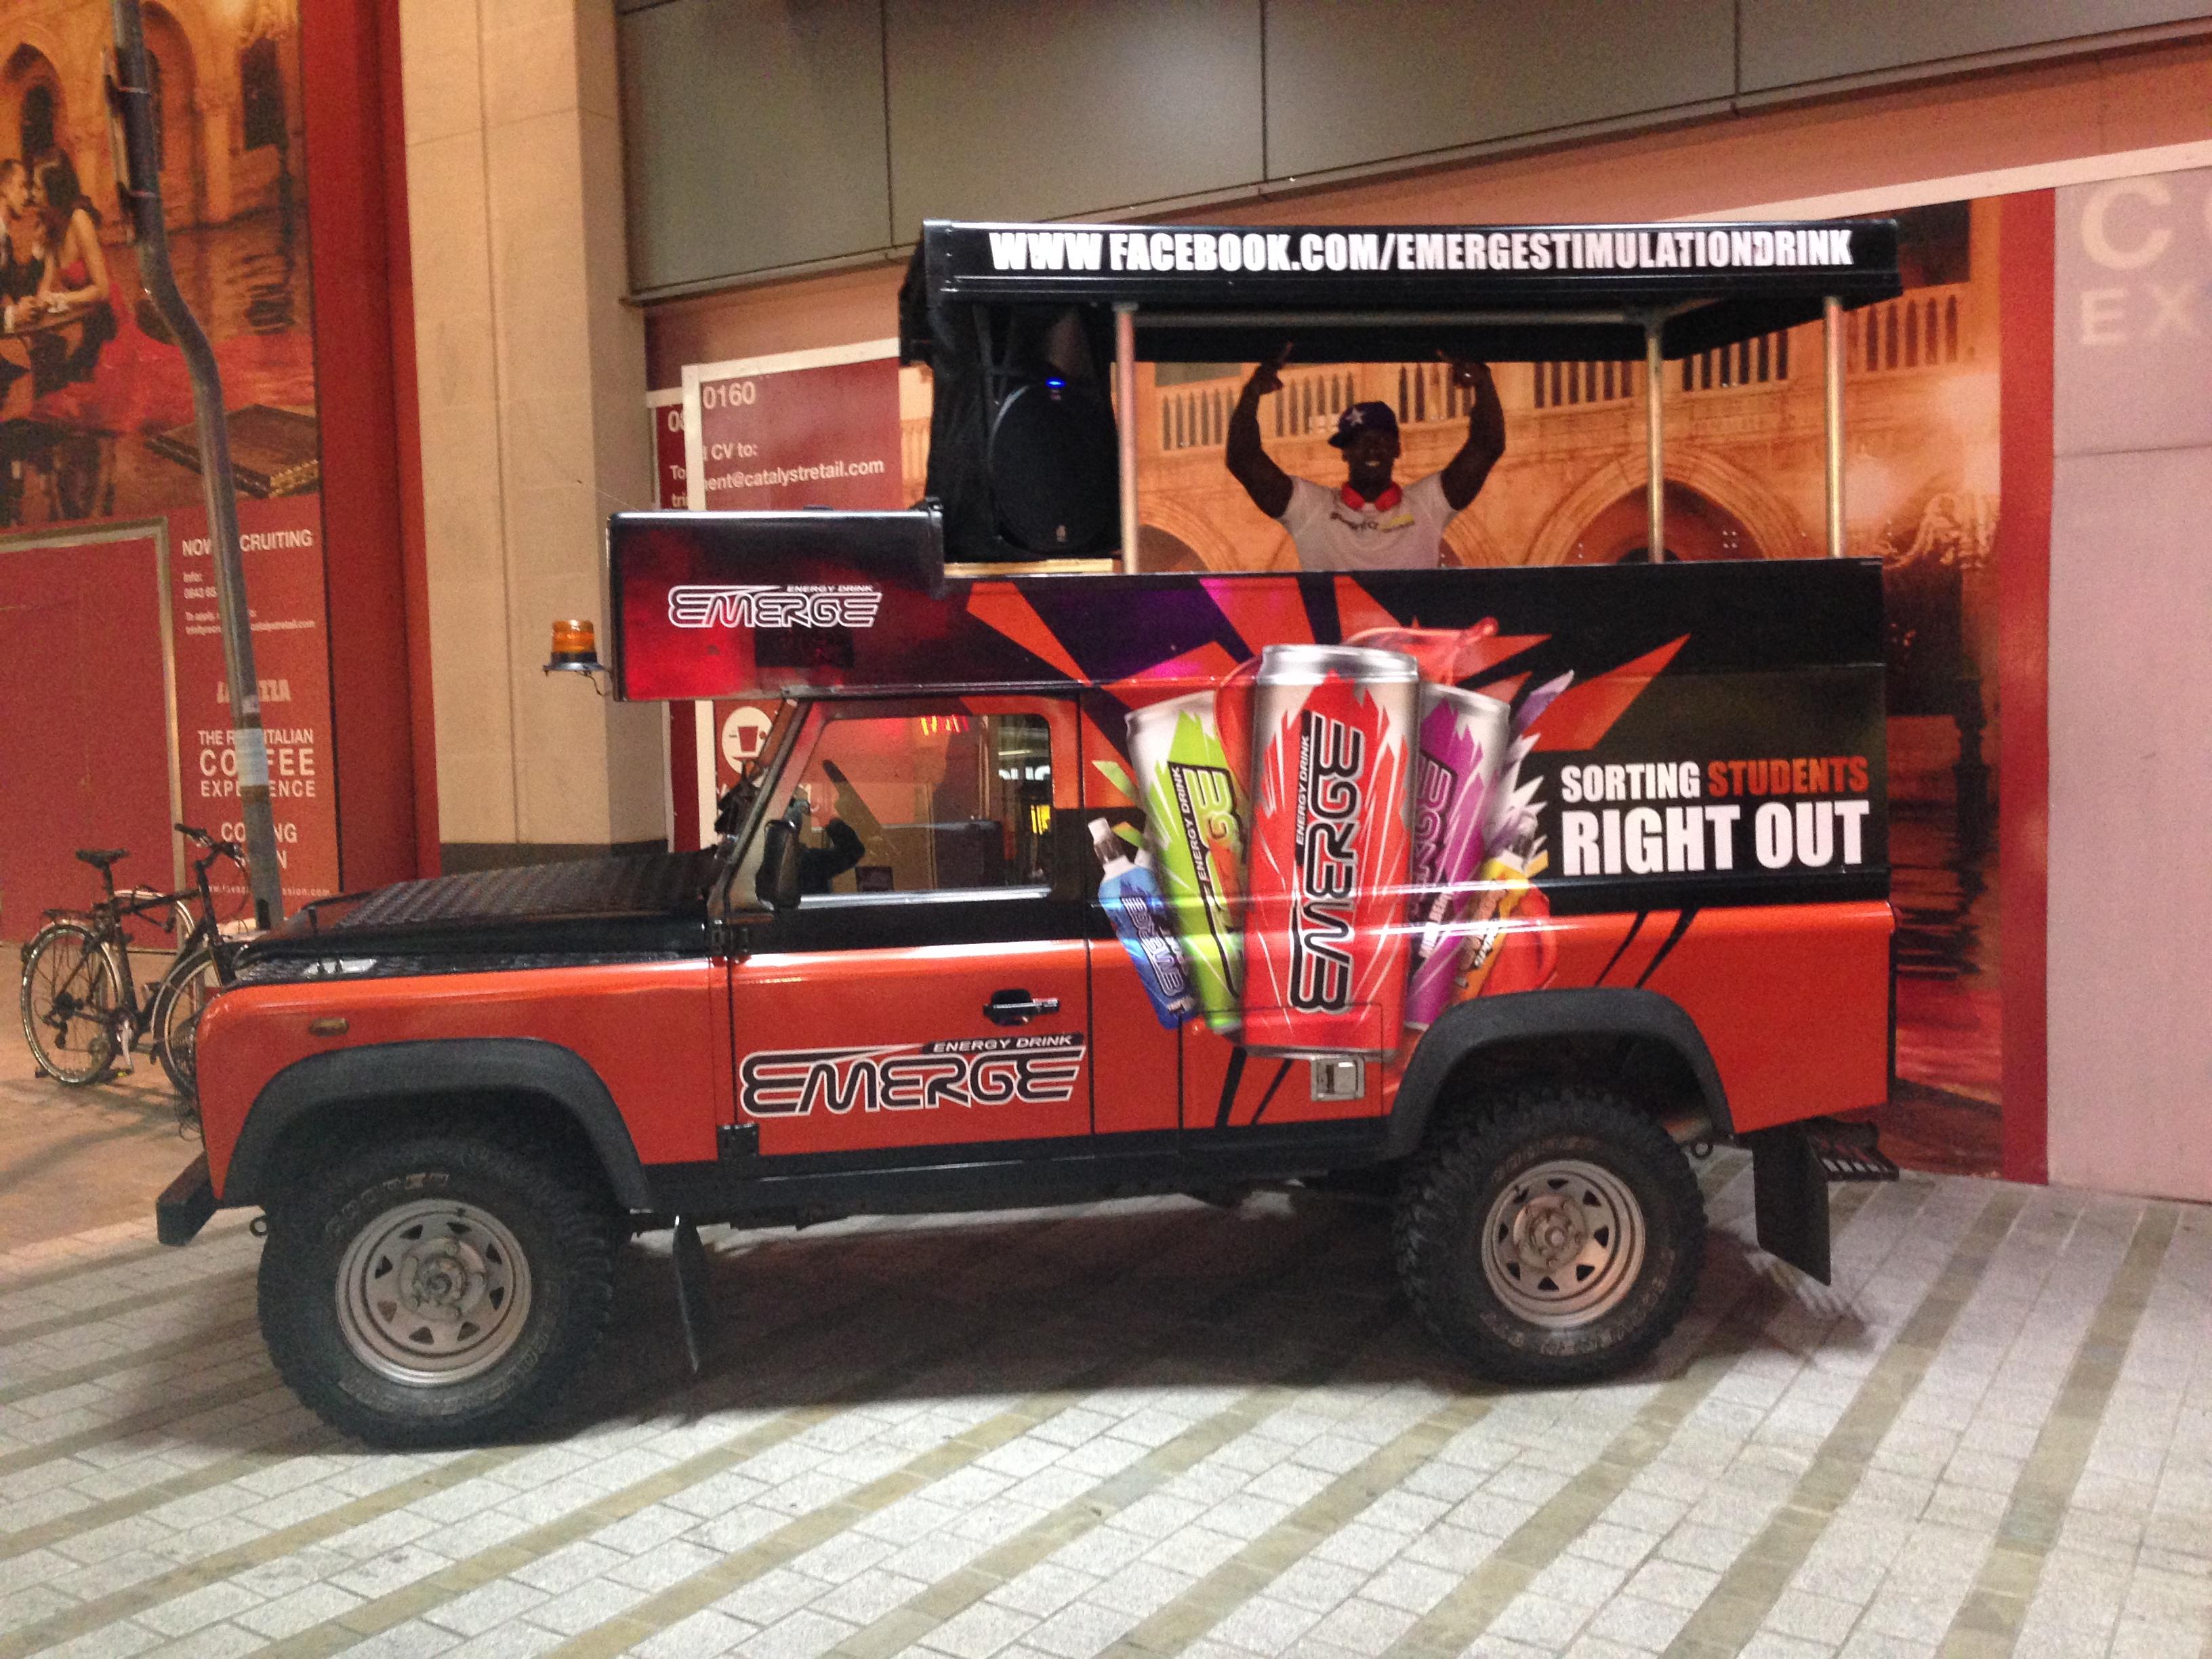 Mobile DJ Jeep